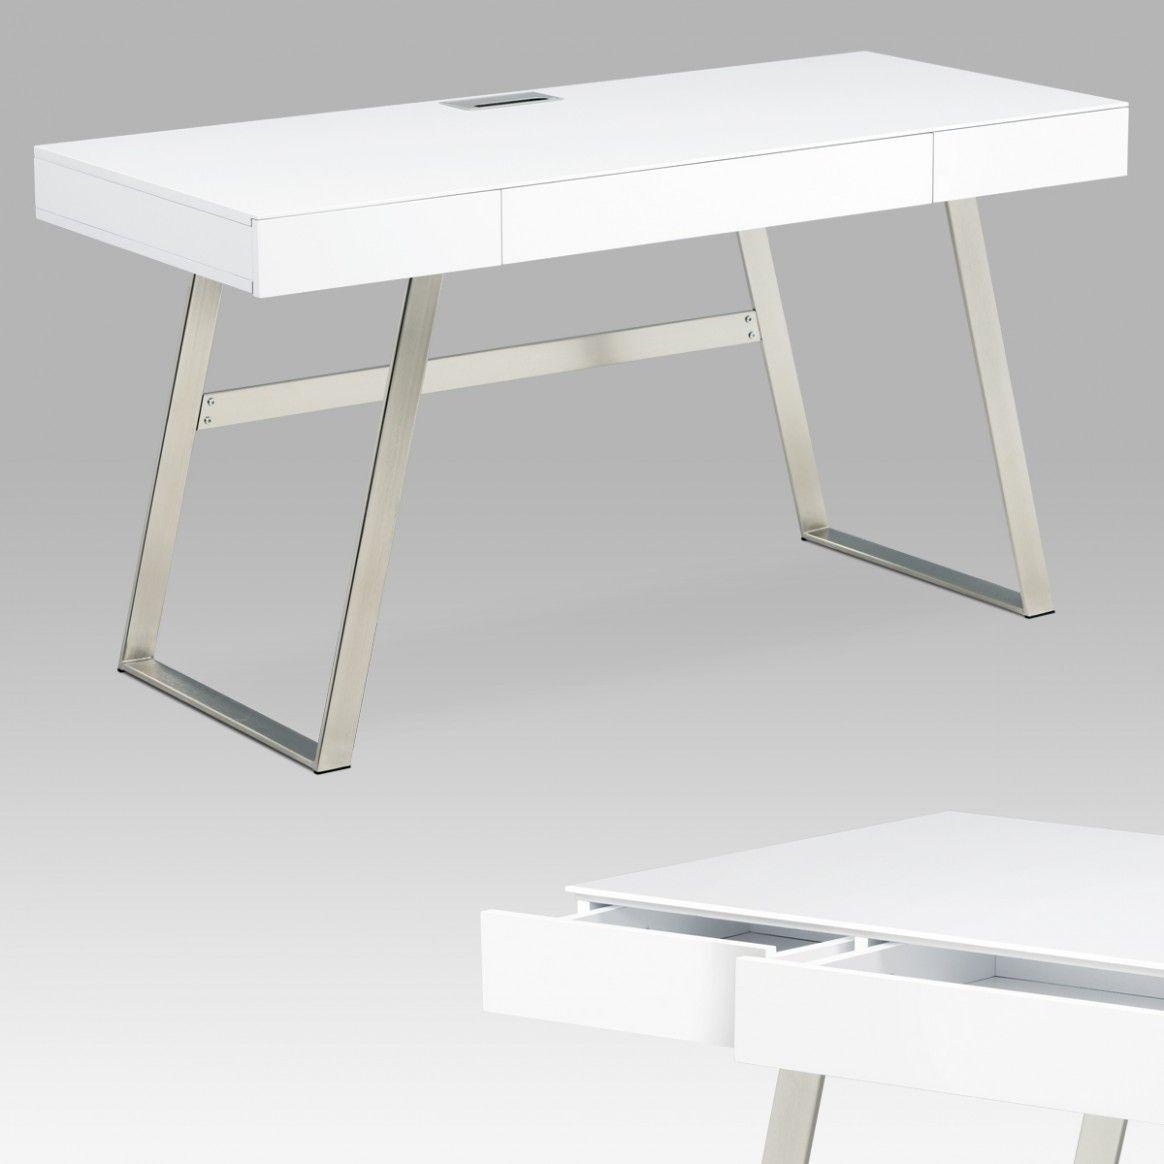 Office Desk White Mdf Matt Brushed Nickel 12 Drawers In 2020 Office Desk White Desks White Desk Office